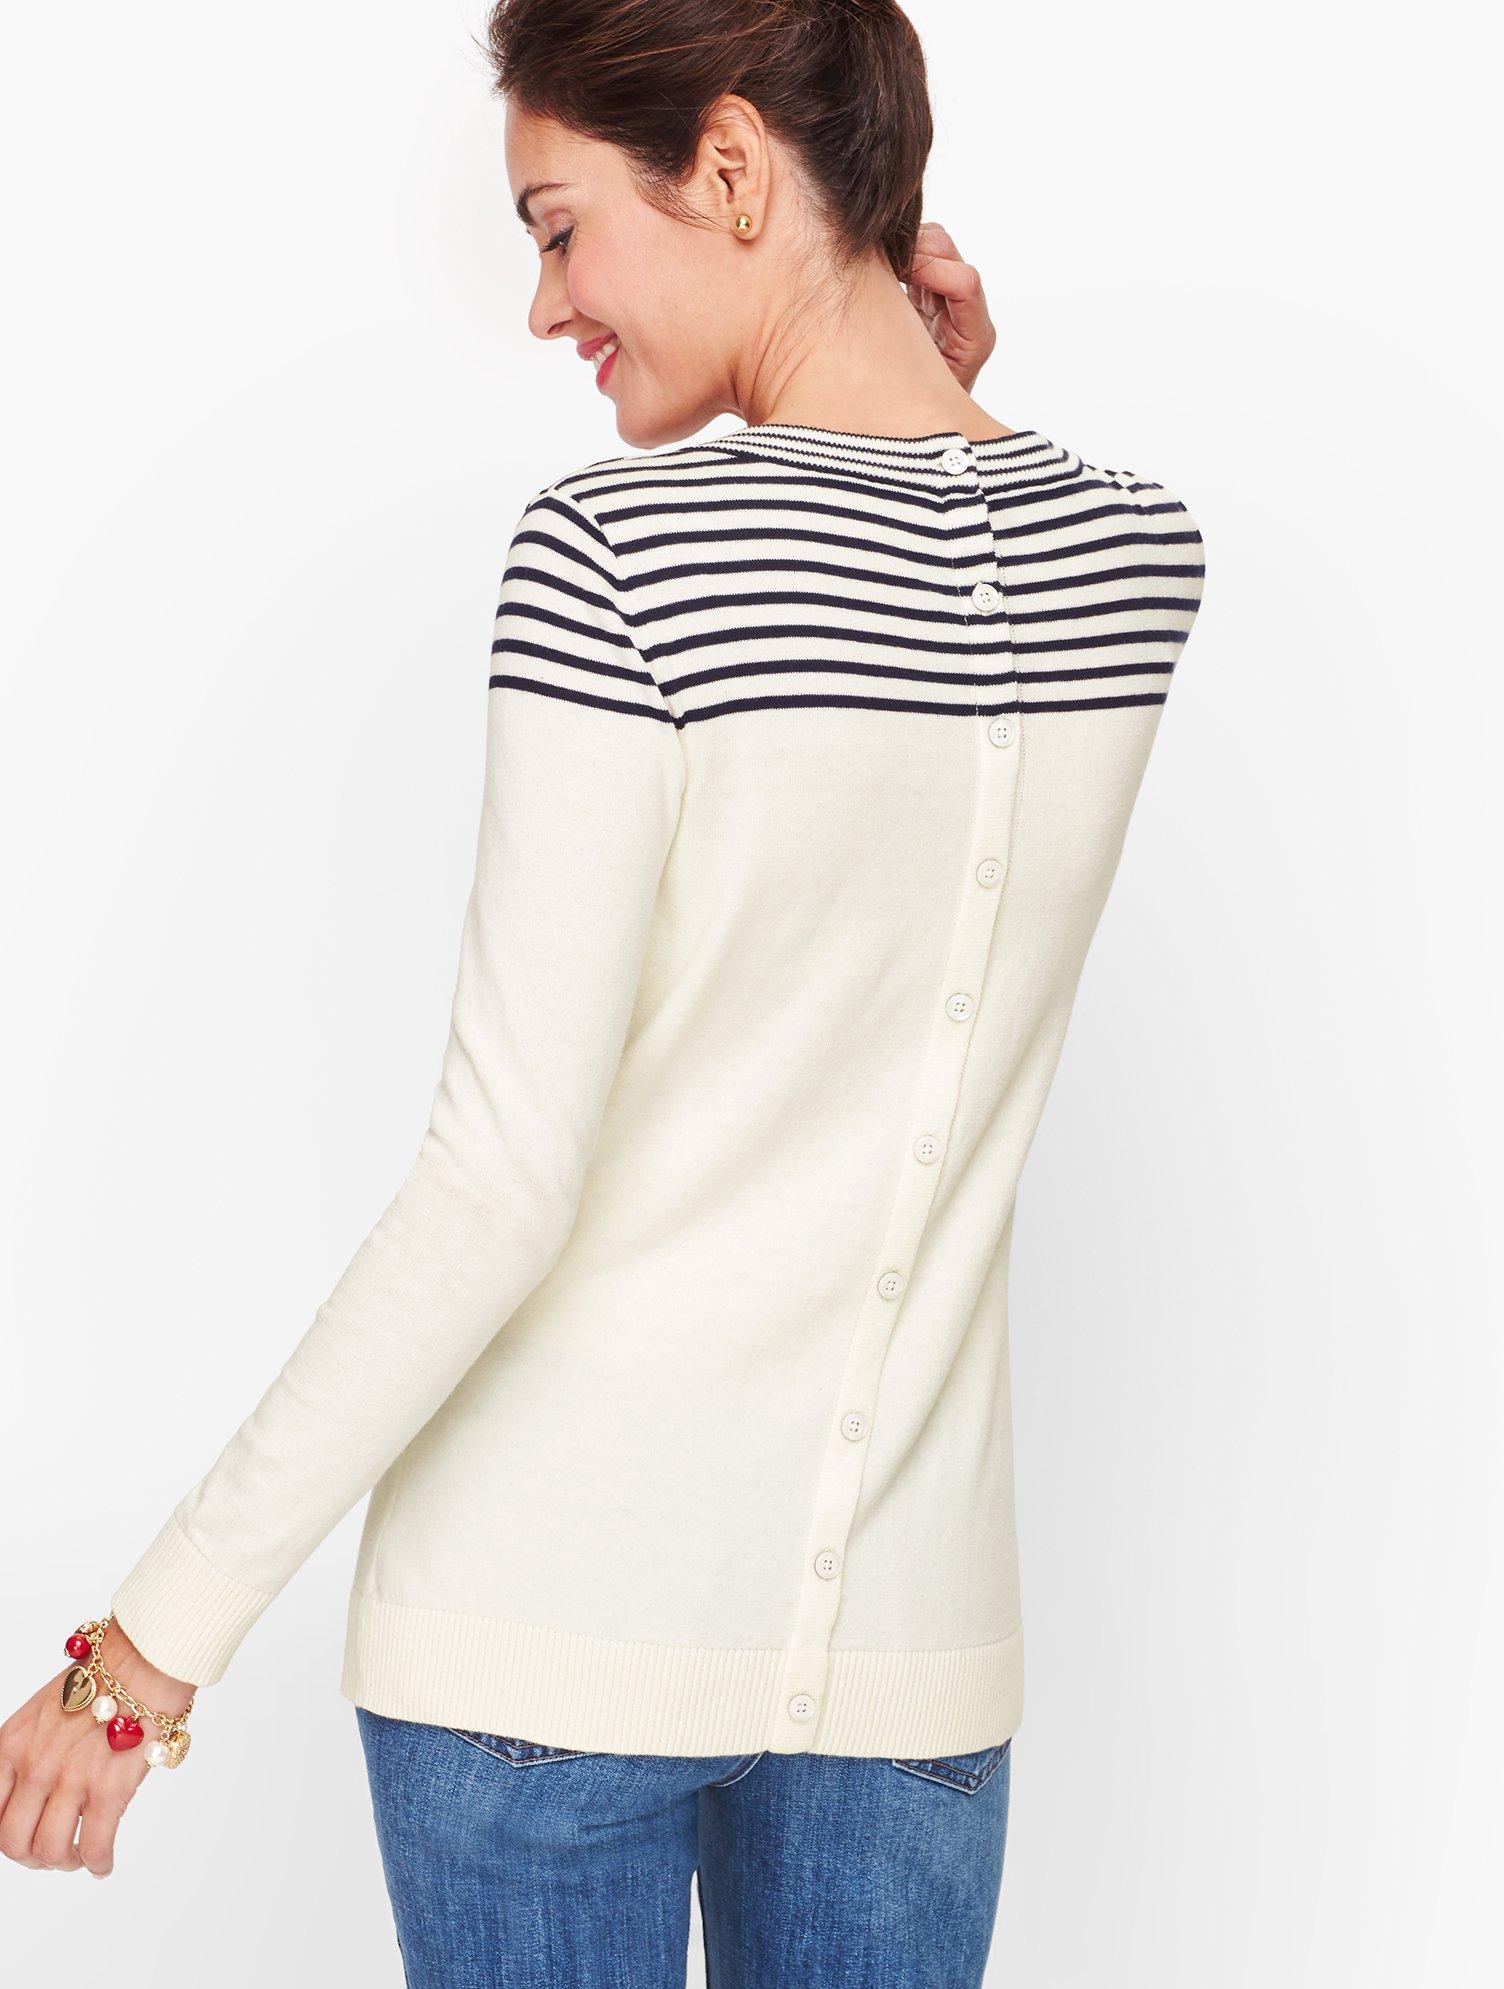 Button Back Heart Sweater | Talbots